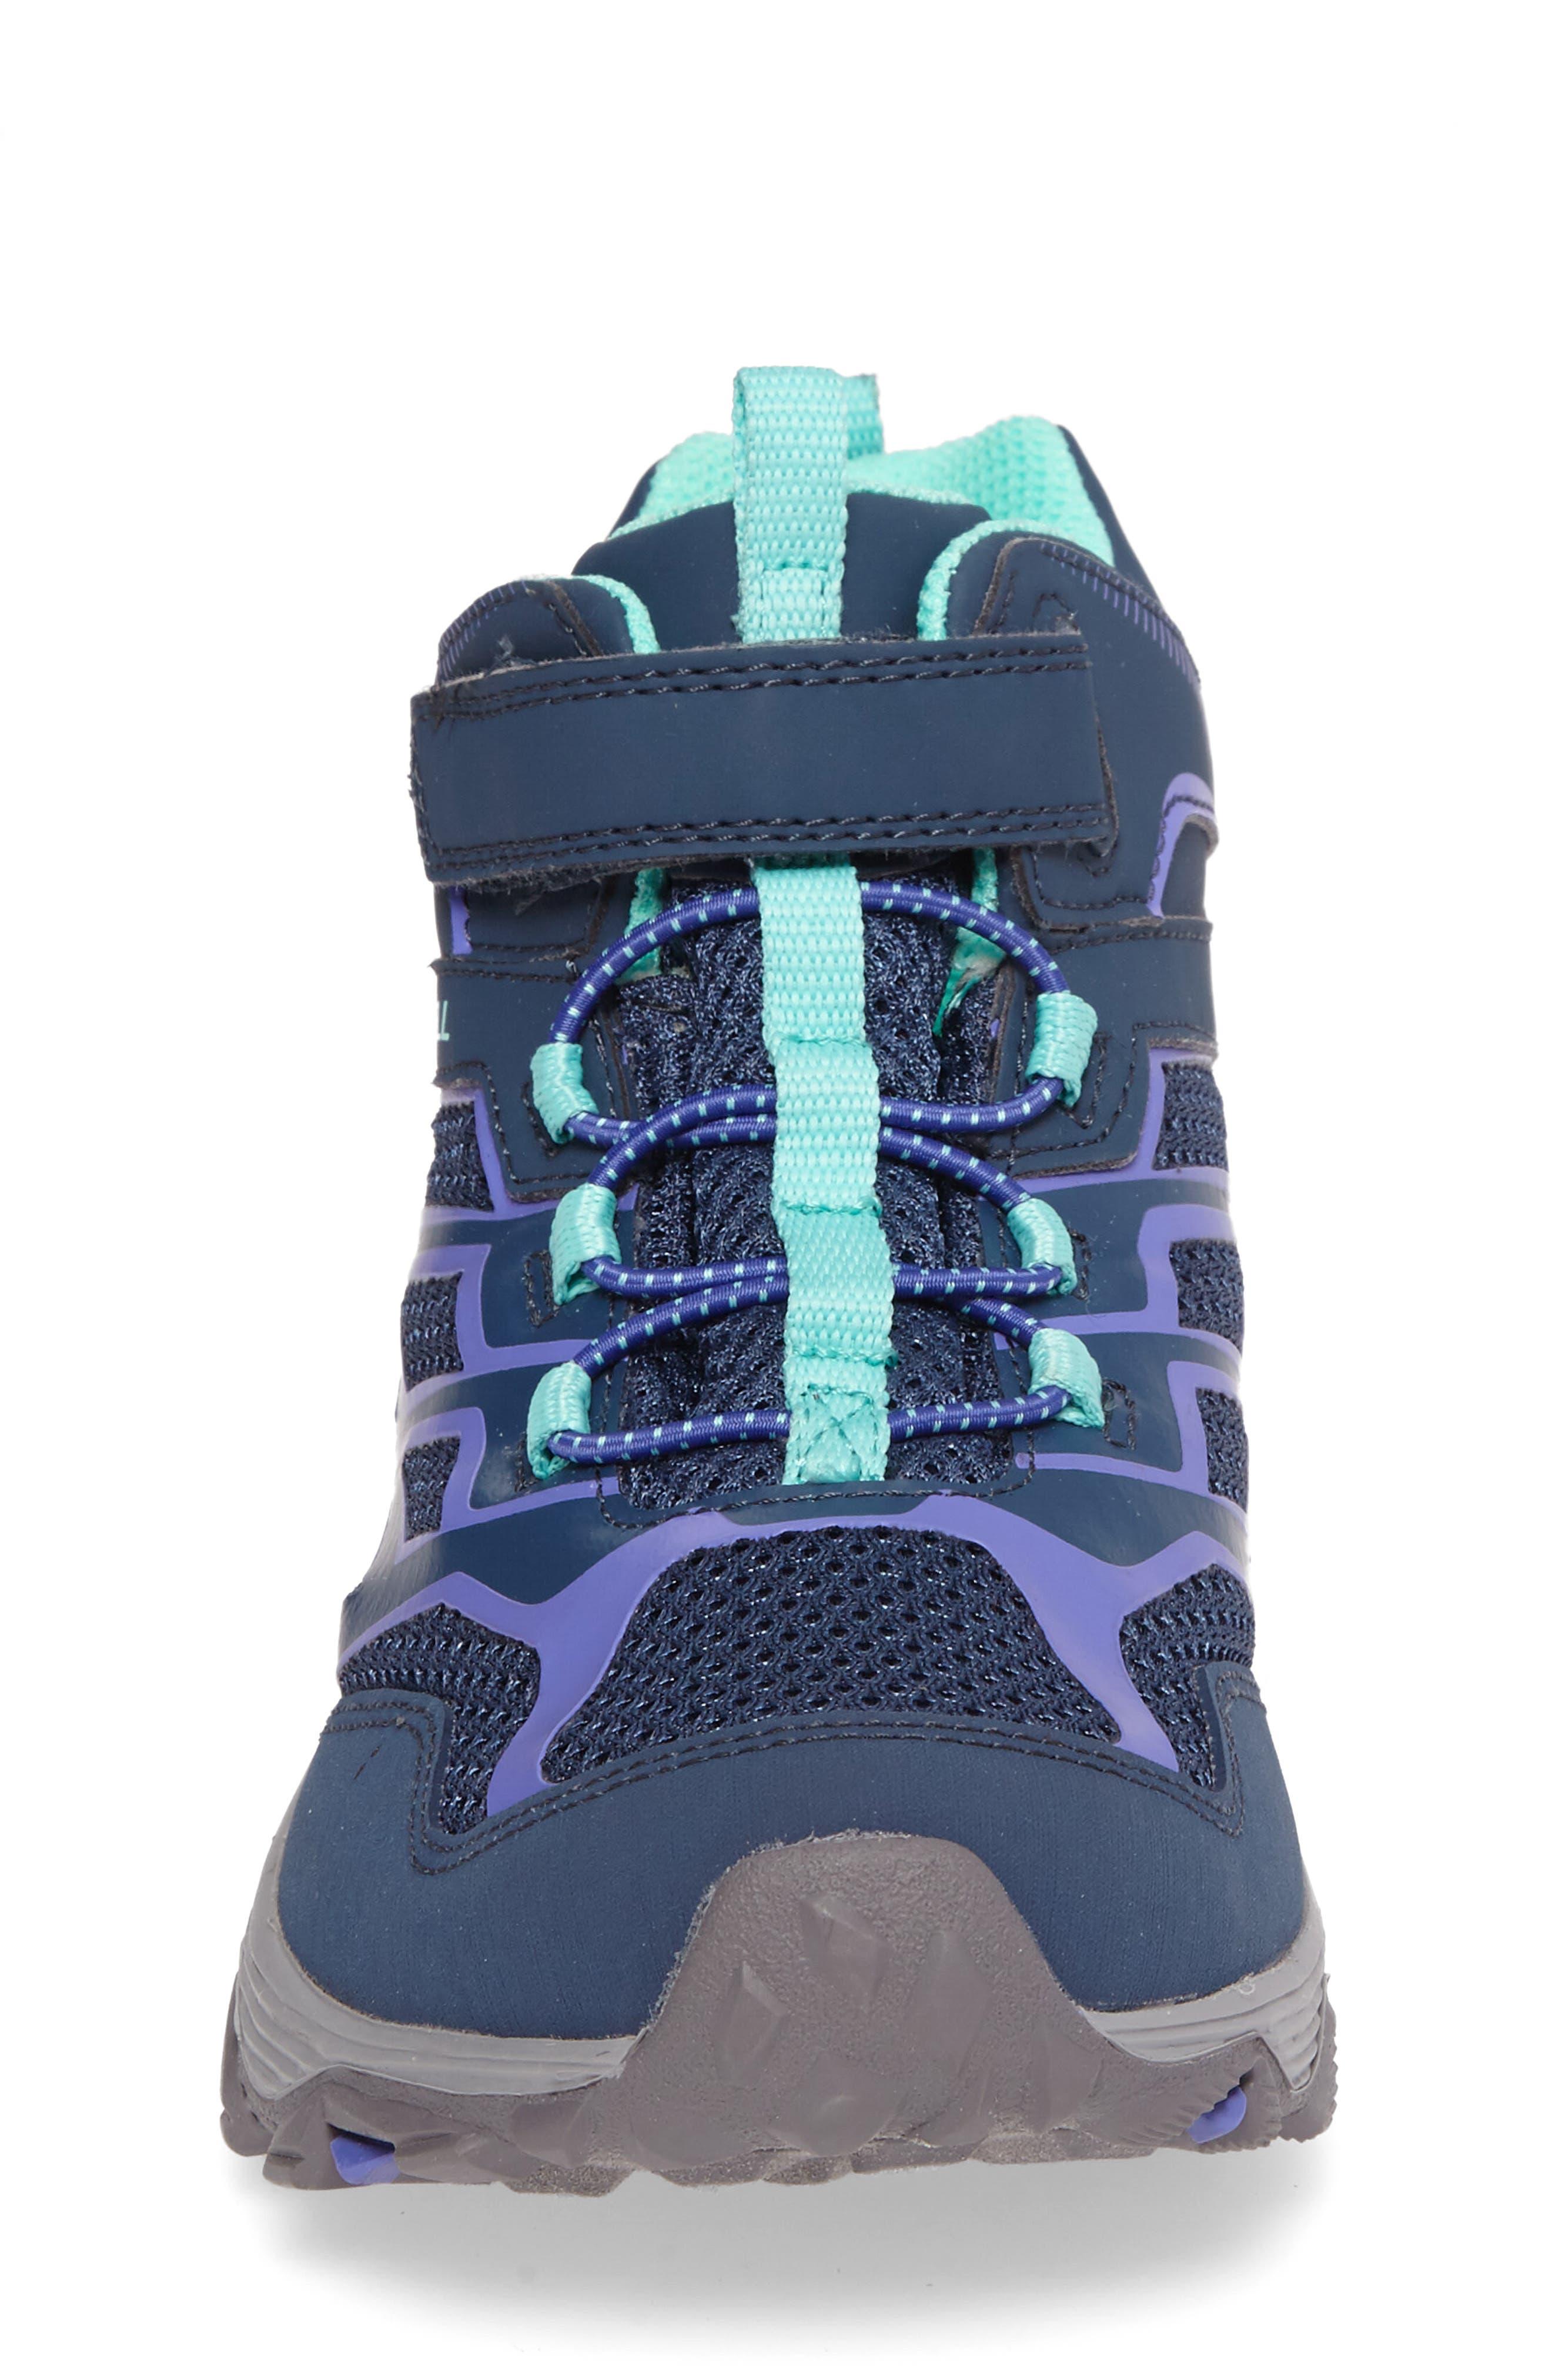 Alternate Image 4  - Merrell Moab FST Polar Mid Insulated Waterproof Sneaker Boot (Baby, Walker, Toddler, Little Kid & Big Kid)